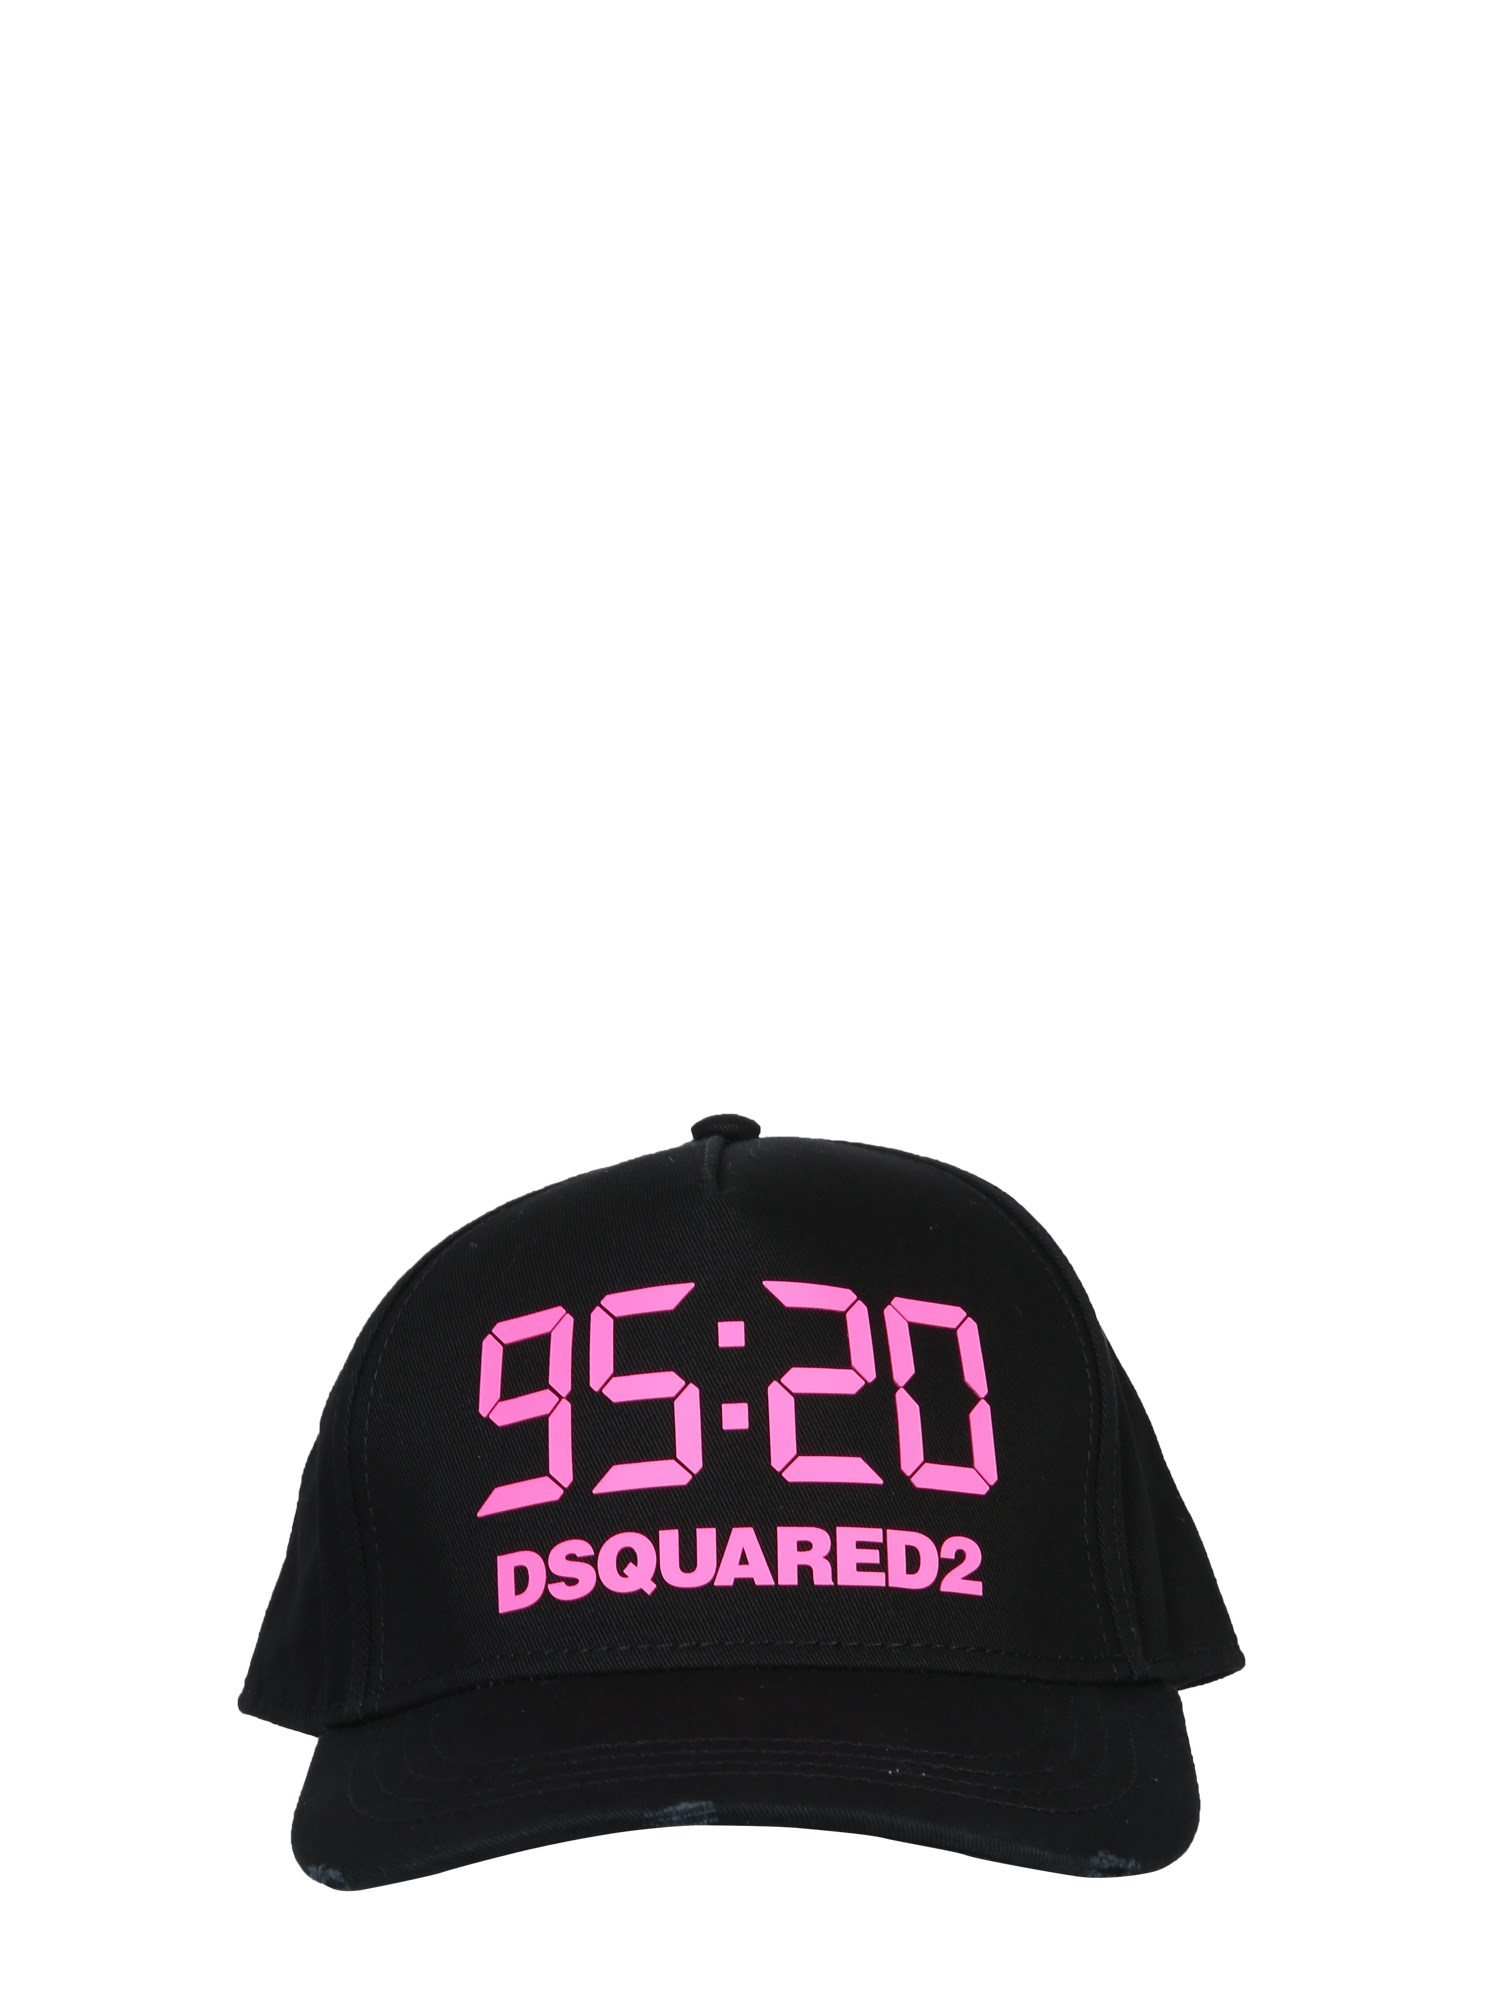 Dsquared2 Caps BASEBALL CAP